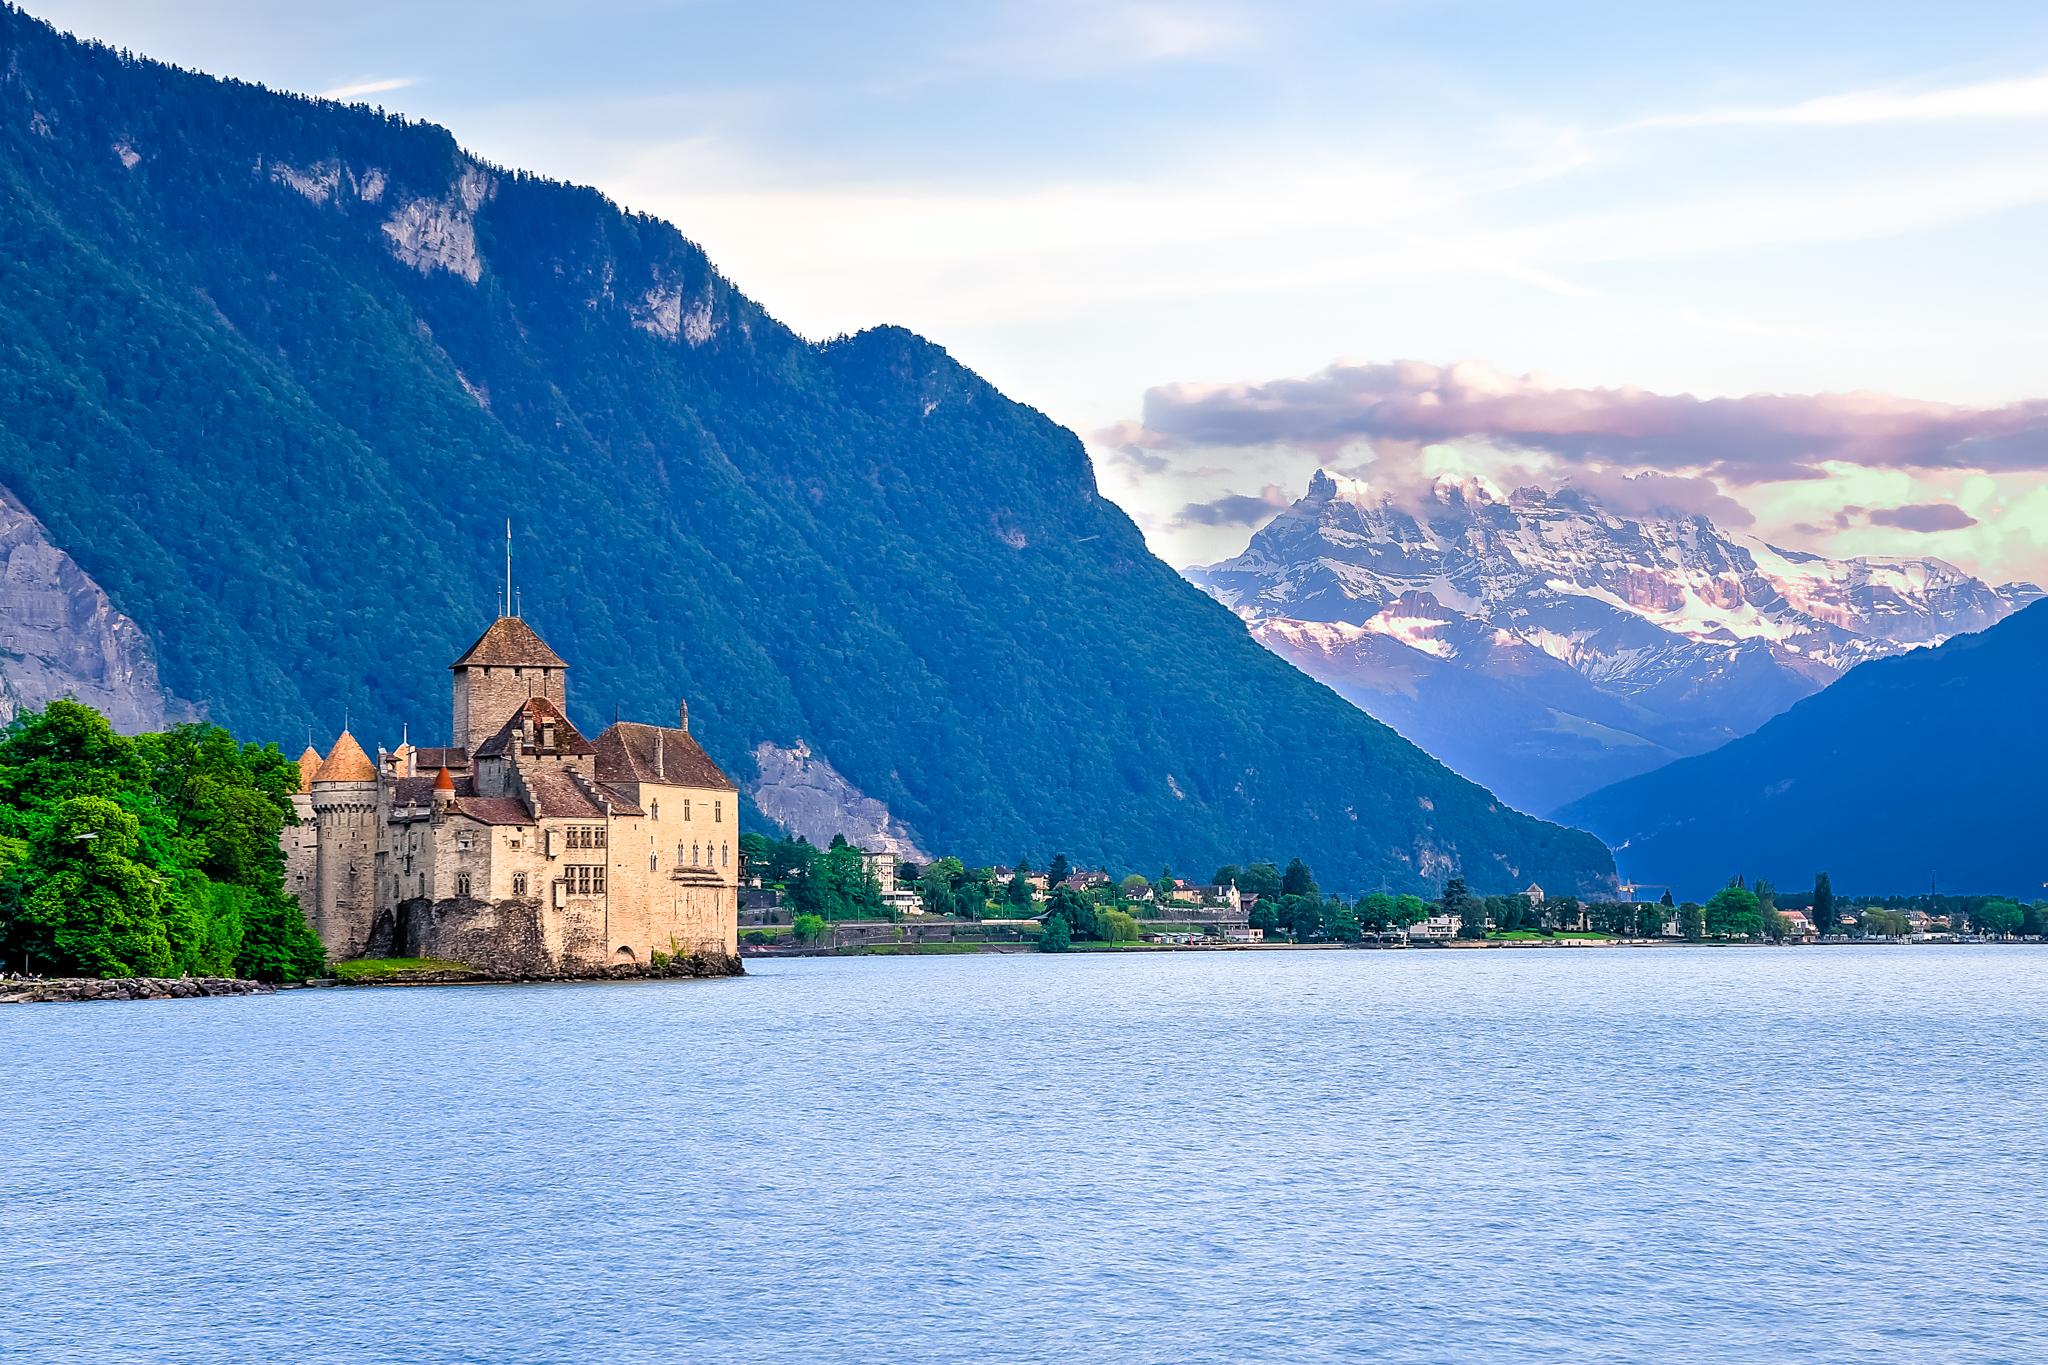 Dicas de viagem de Montreux na Suíça